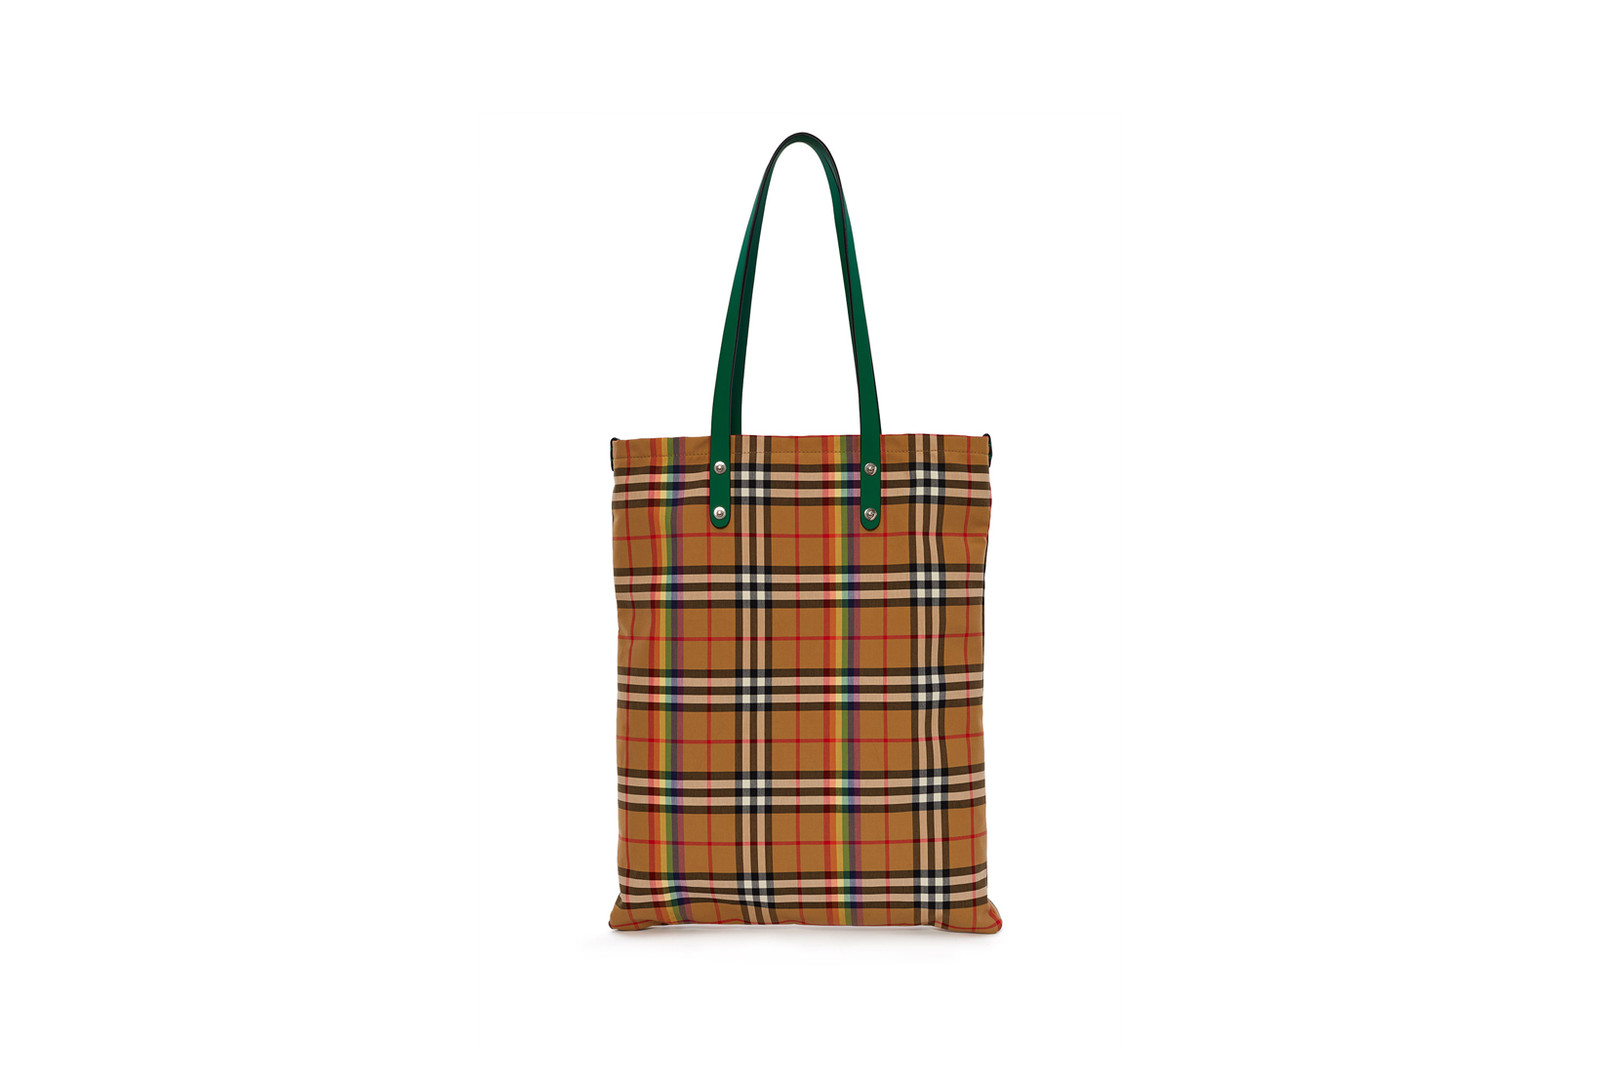 Celine Tote Bag White Black Square Clutch